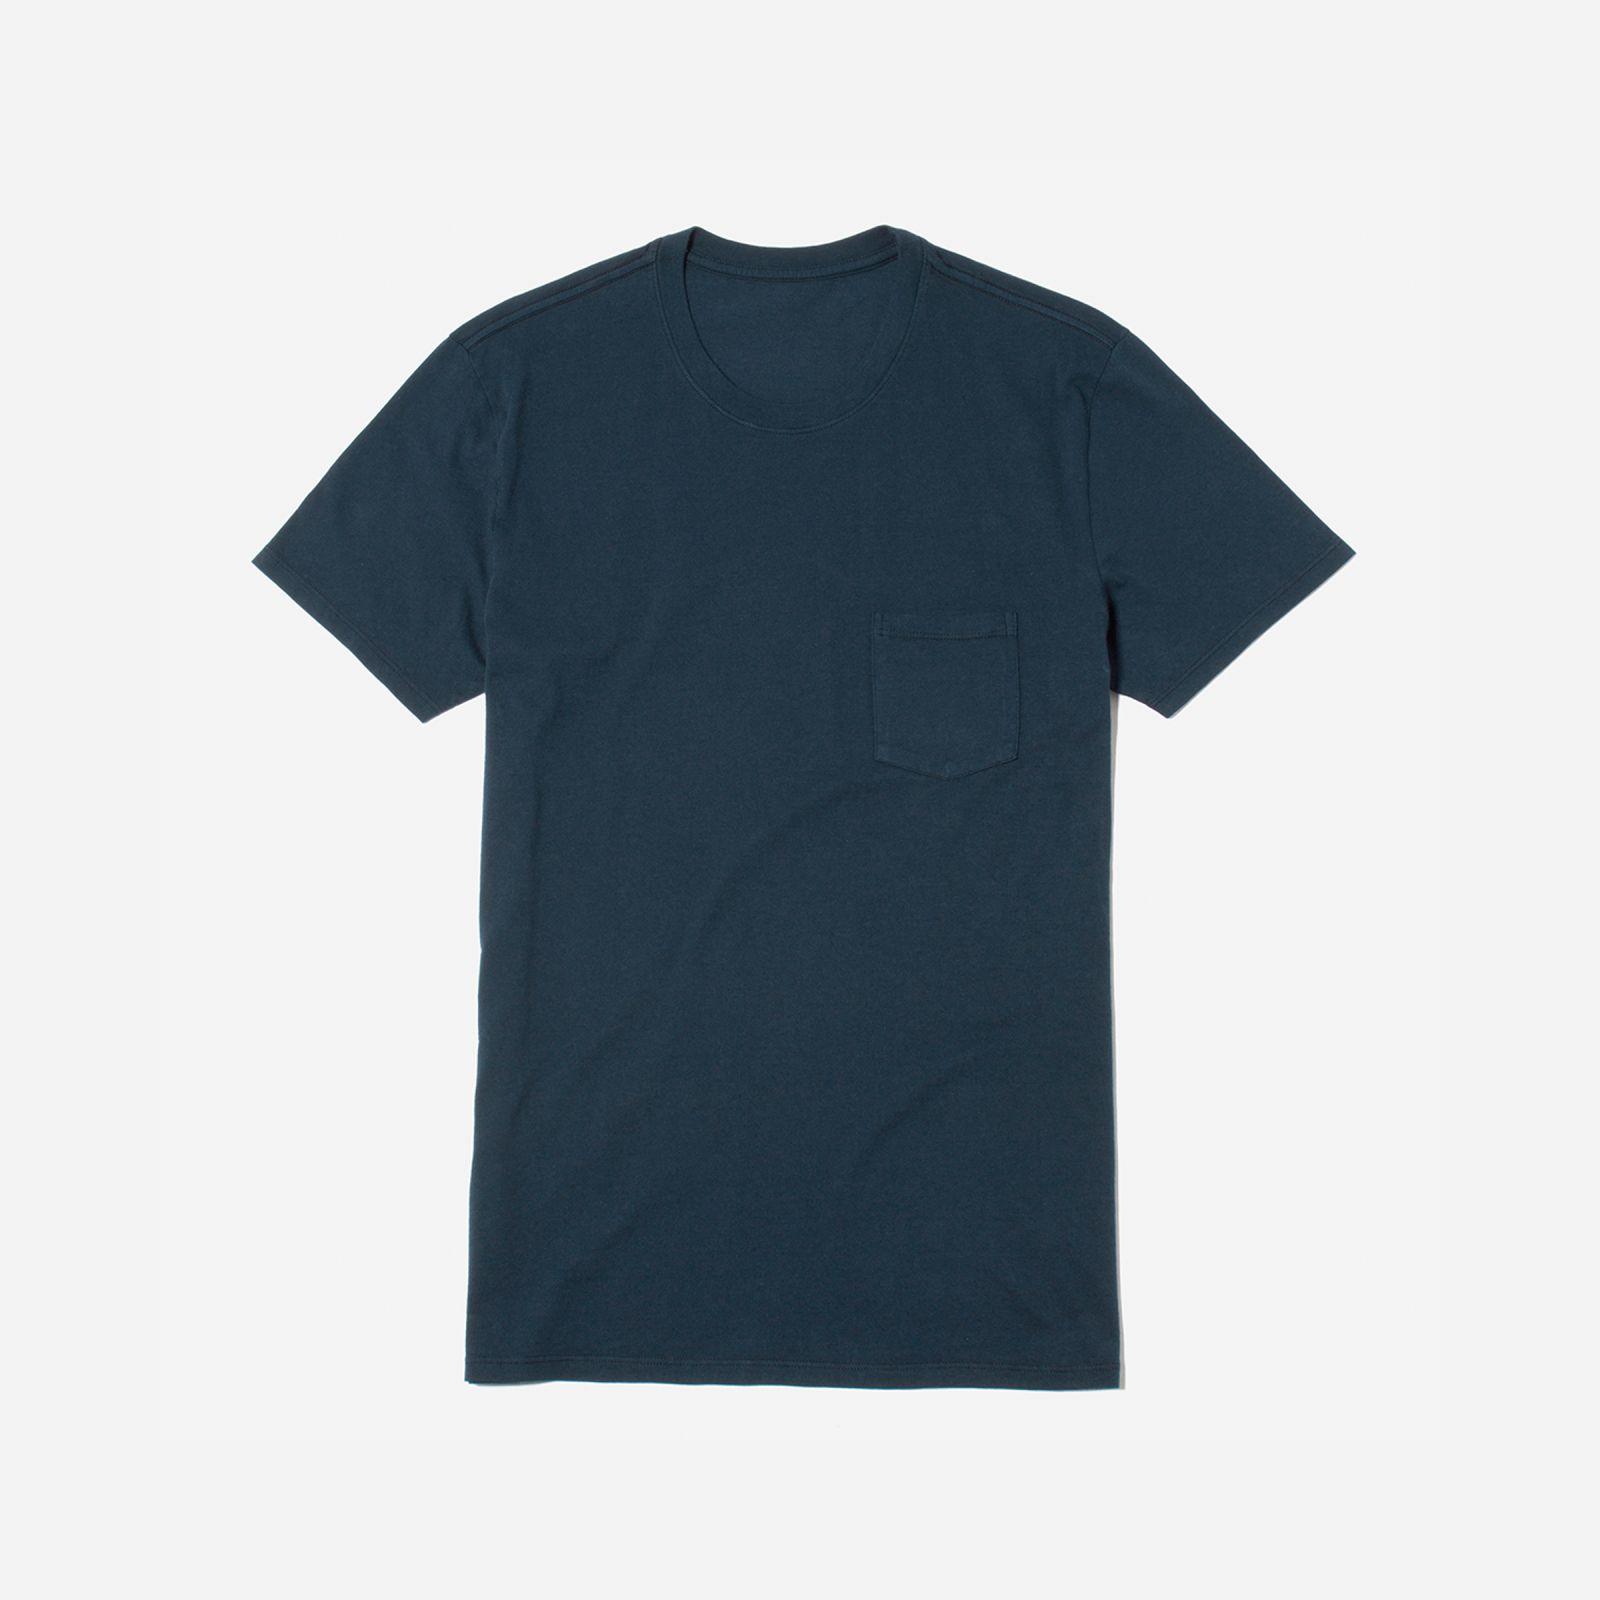 men's cotton pocket t-shirt by everlane in true navy, size xs